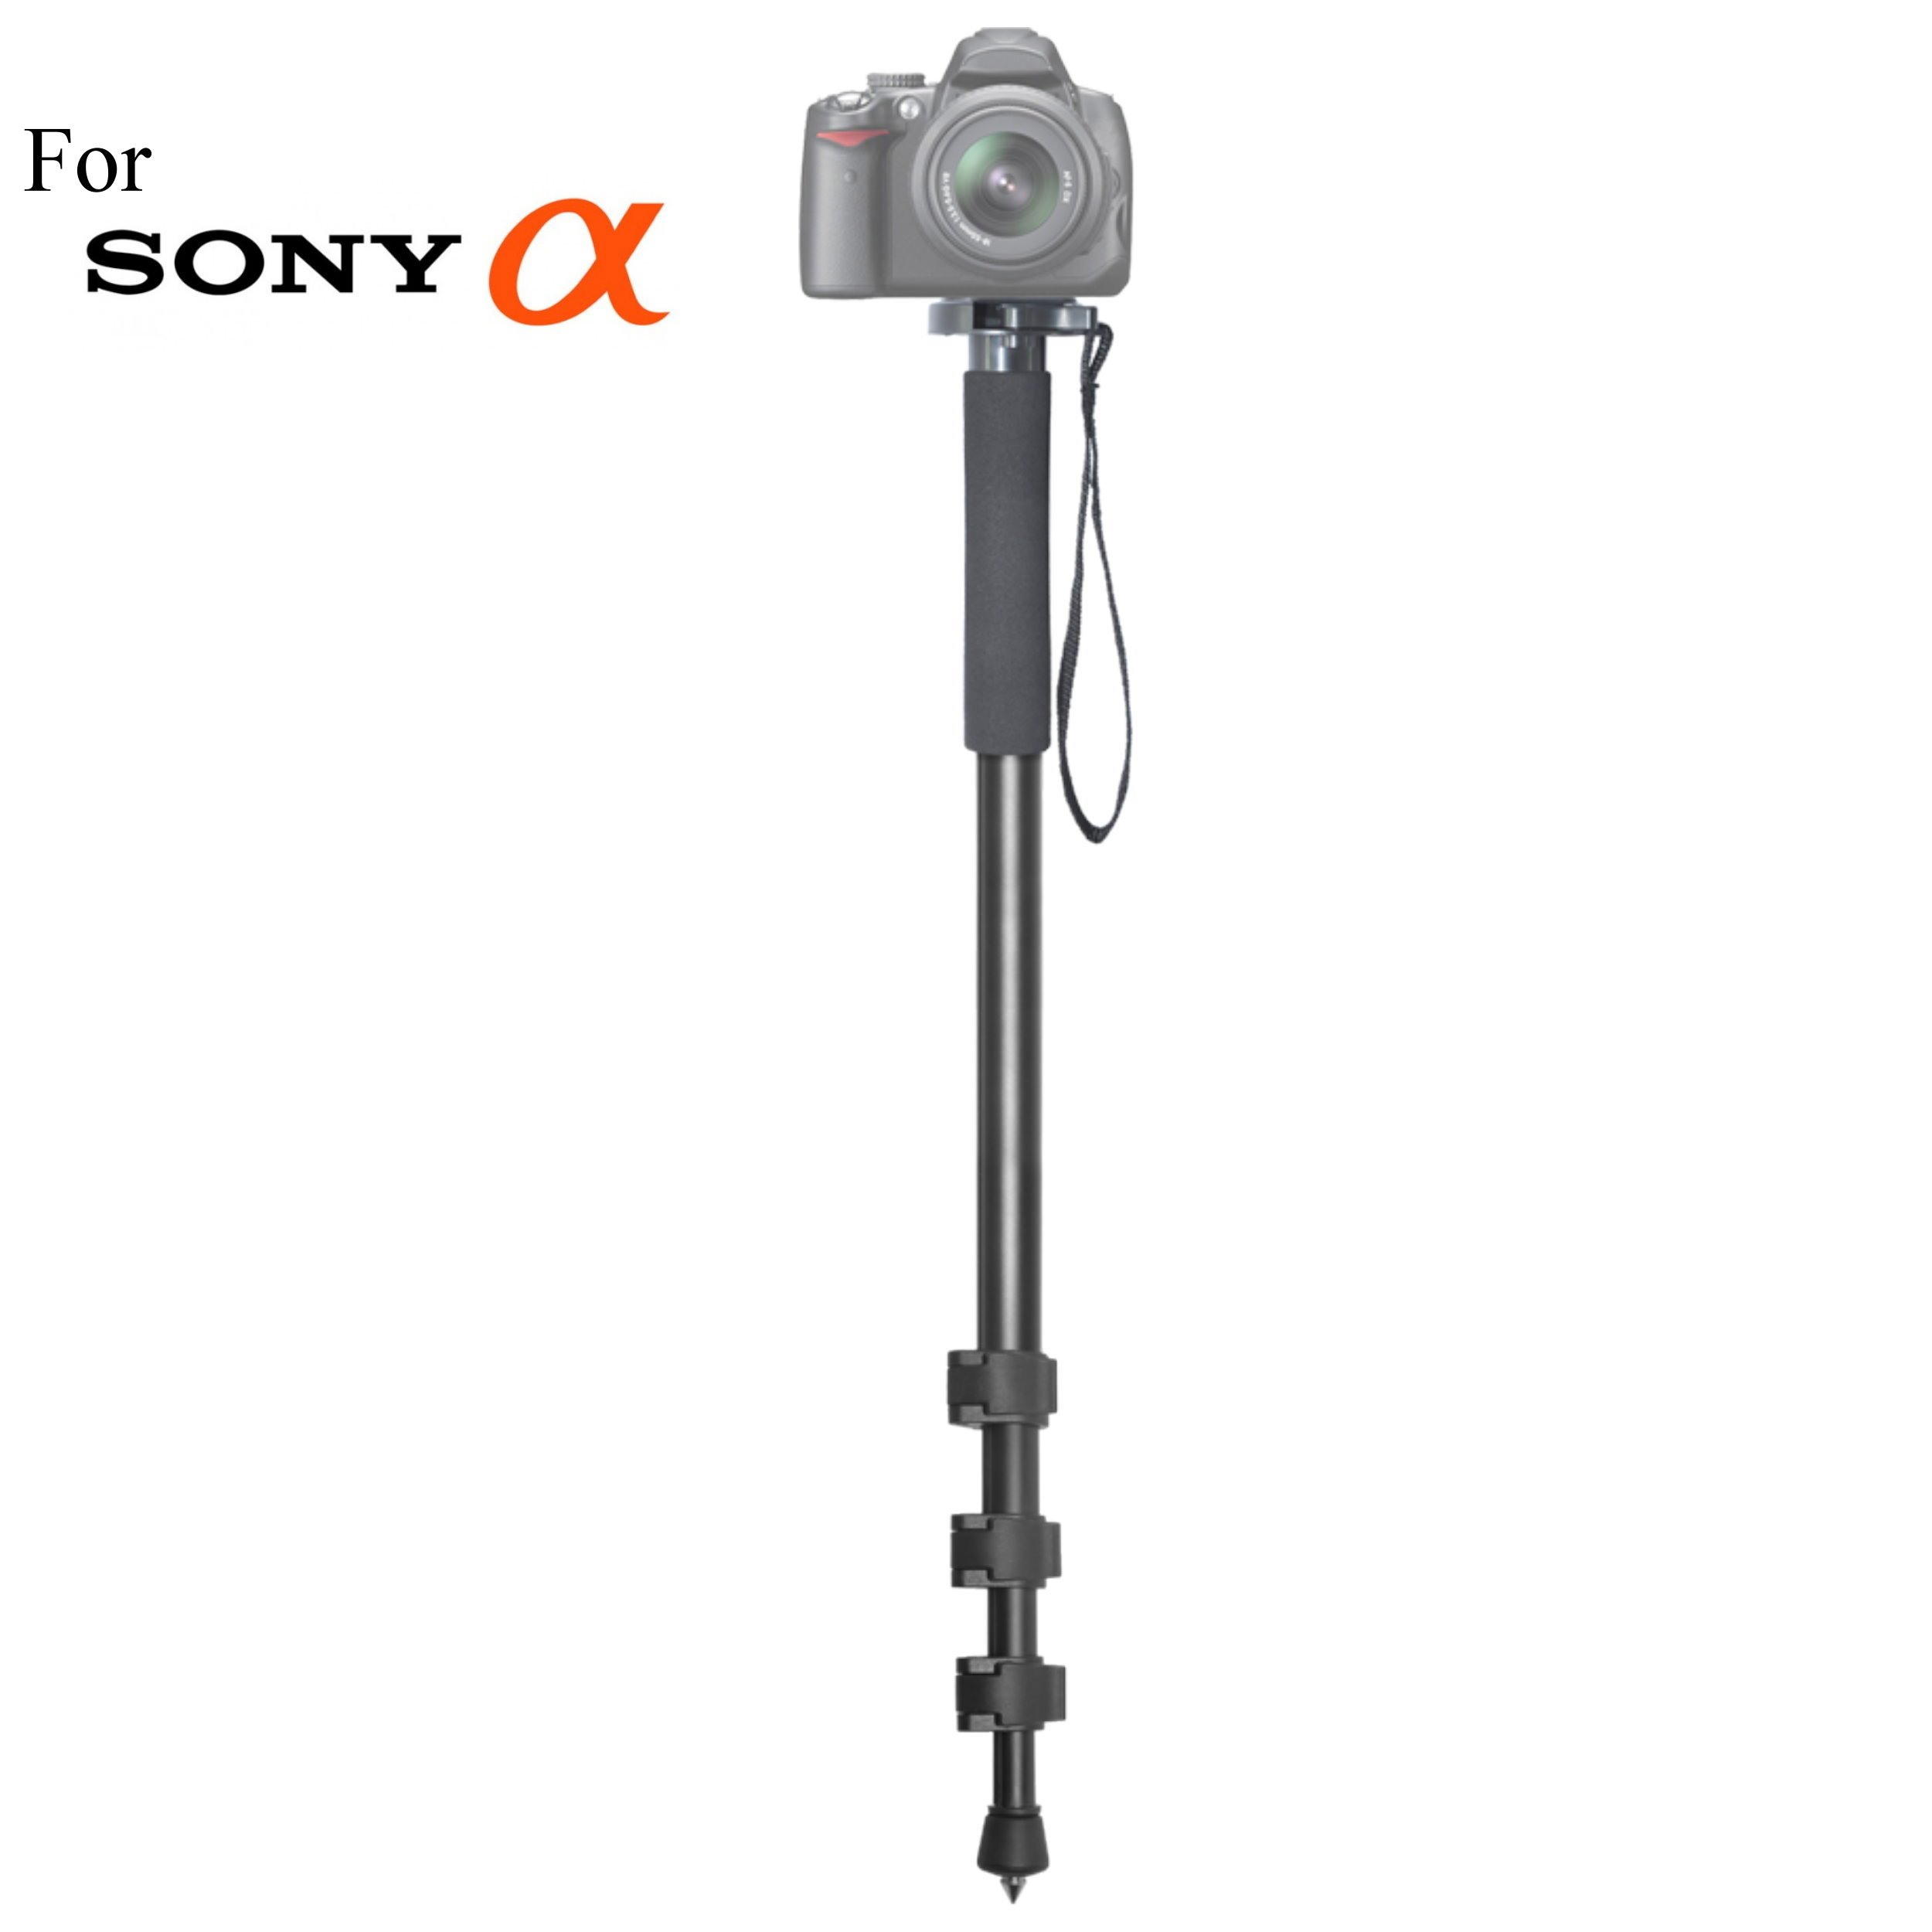 Versatile 72'' Monopod Camera Stick + Quick Release for Sony Alpha DSLR-A100, DSLR-A200, DSLR-A230, DSLR-A290, DSLR-A300, DSLR-A330, DSLR-A350, DSLR-A380 Cameras: Collapsible Mono pod, Mono-pod by IDU-PRO